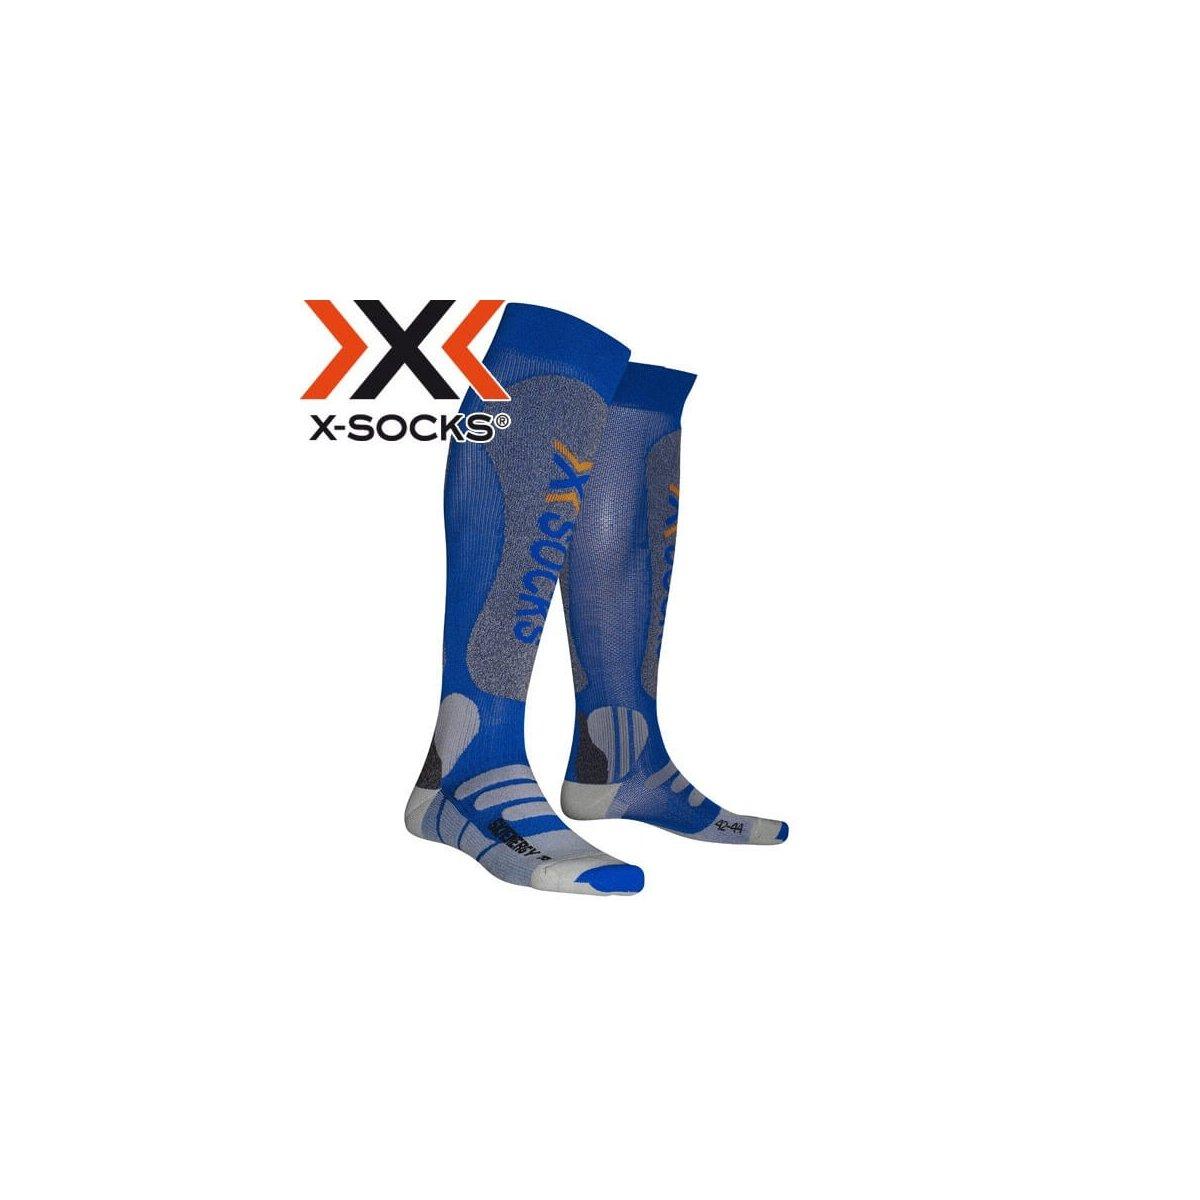 X-Socks X Bionic Energizer - Calcetines de esquí unisex Talla:39-41 EU: Amazon.es: Deportes y aire libre